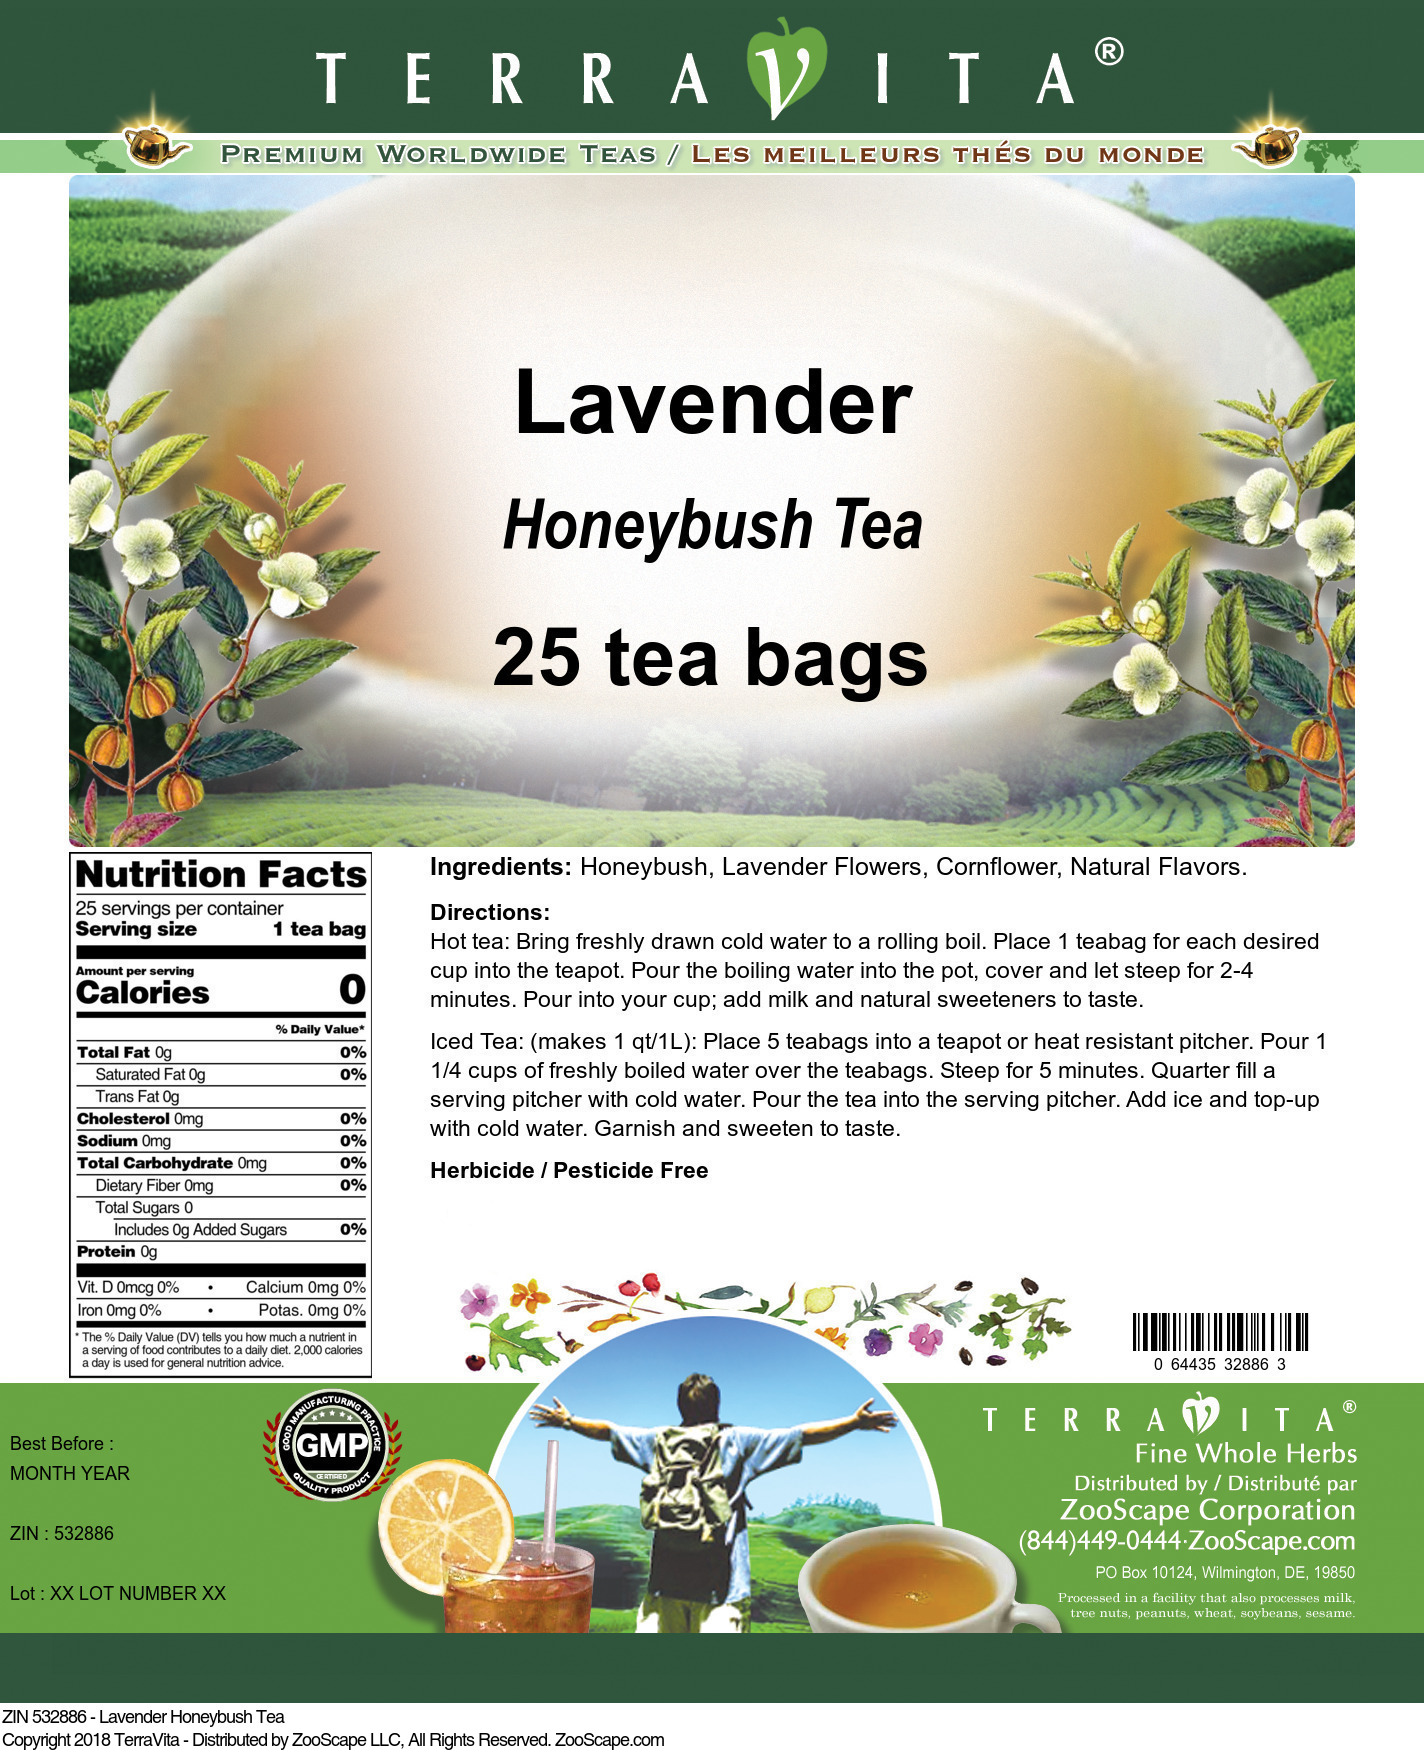 Lavender Honeybush Tea